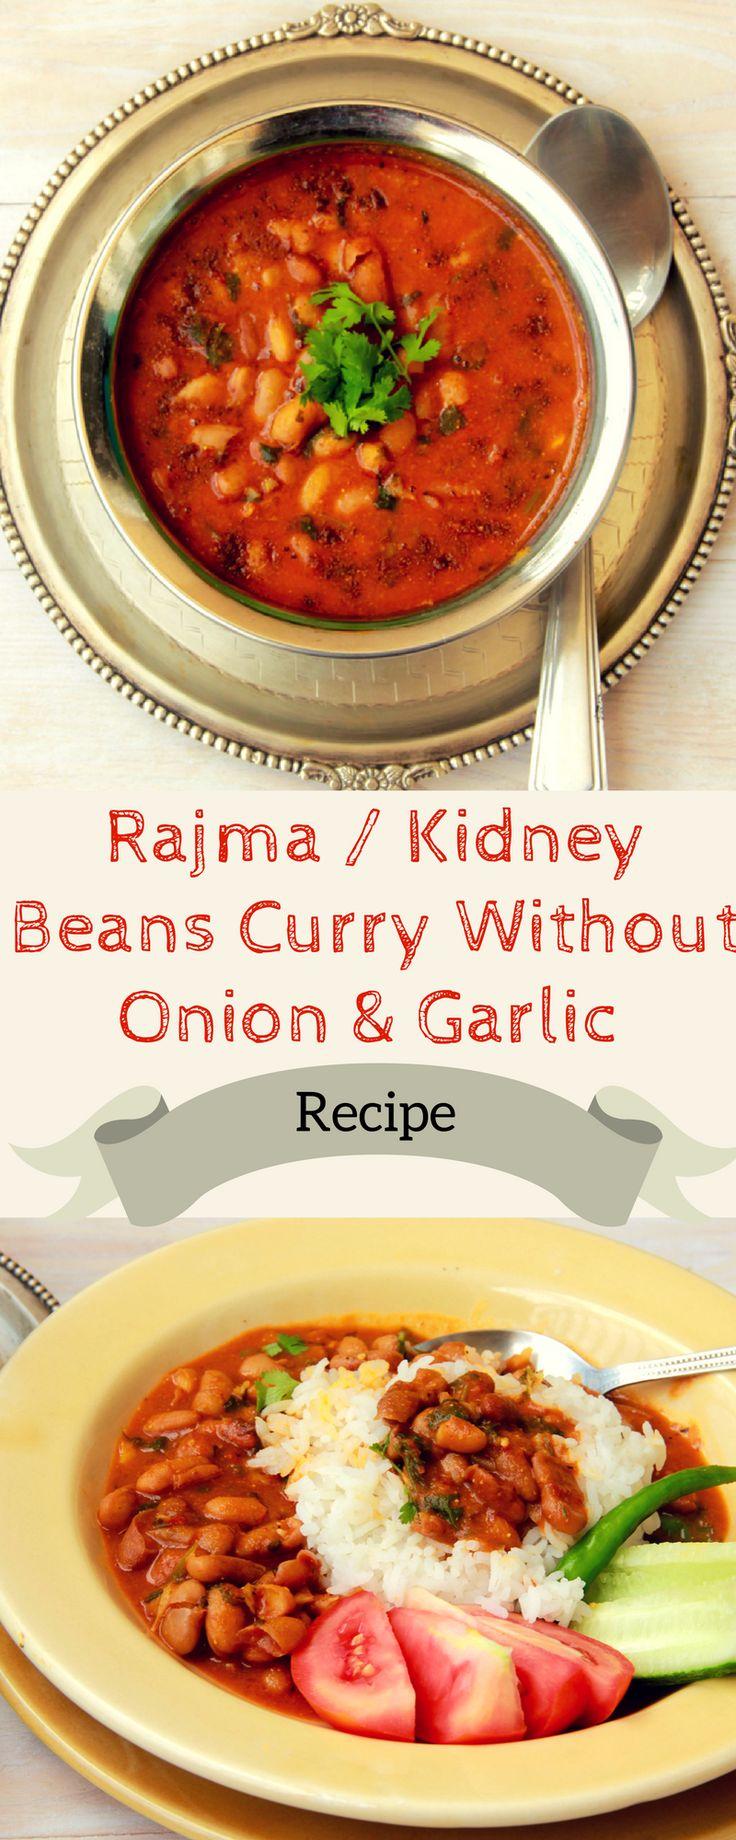 Best 25 jain recipes ideas on pinterest jain food jain food punjabi rajma without onion garlic a recipe for rajma red kidney bean curry without forumfinder Images